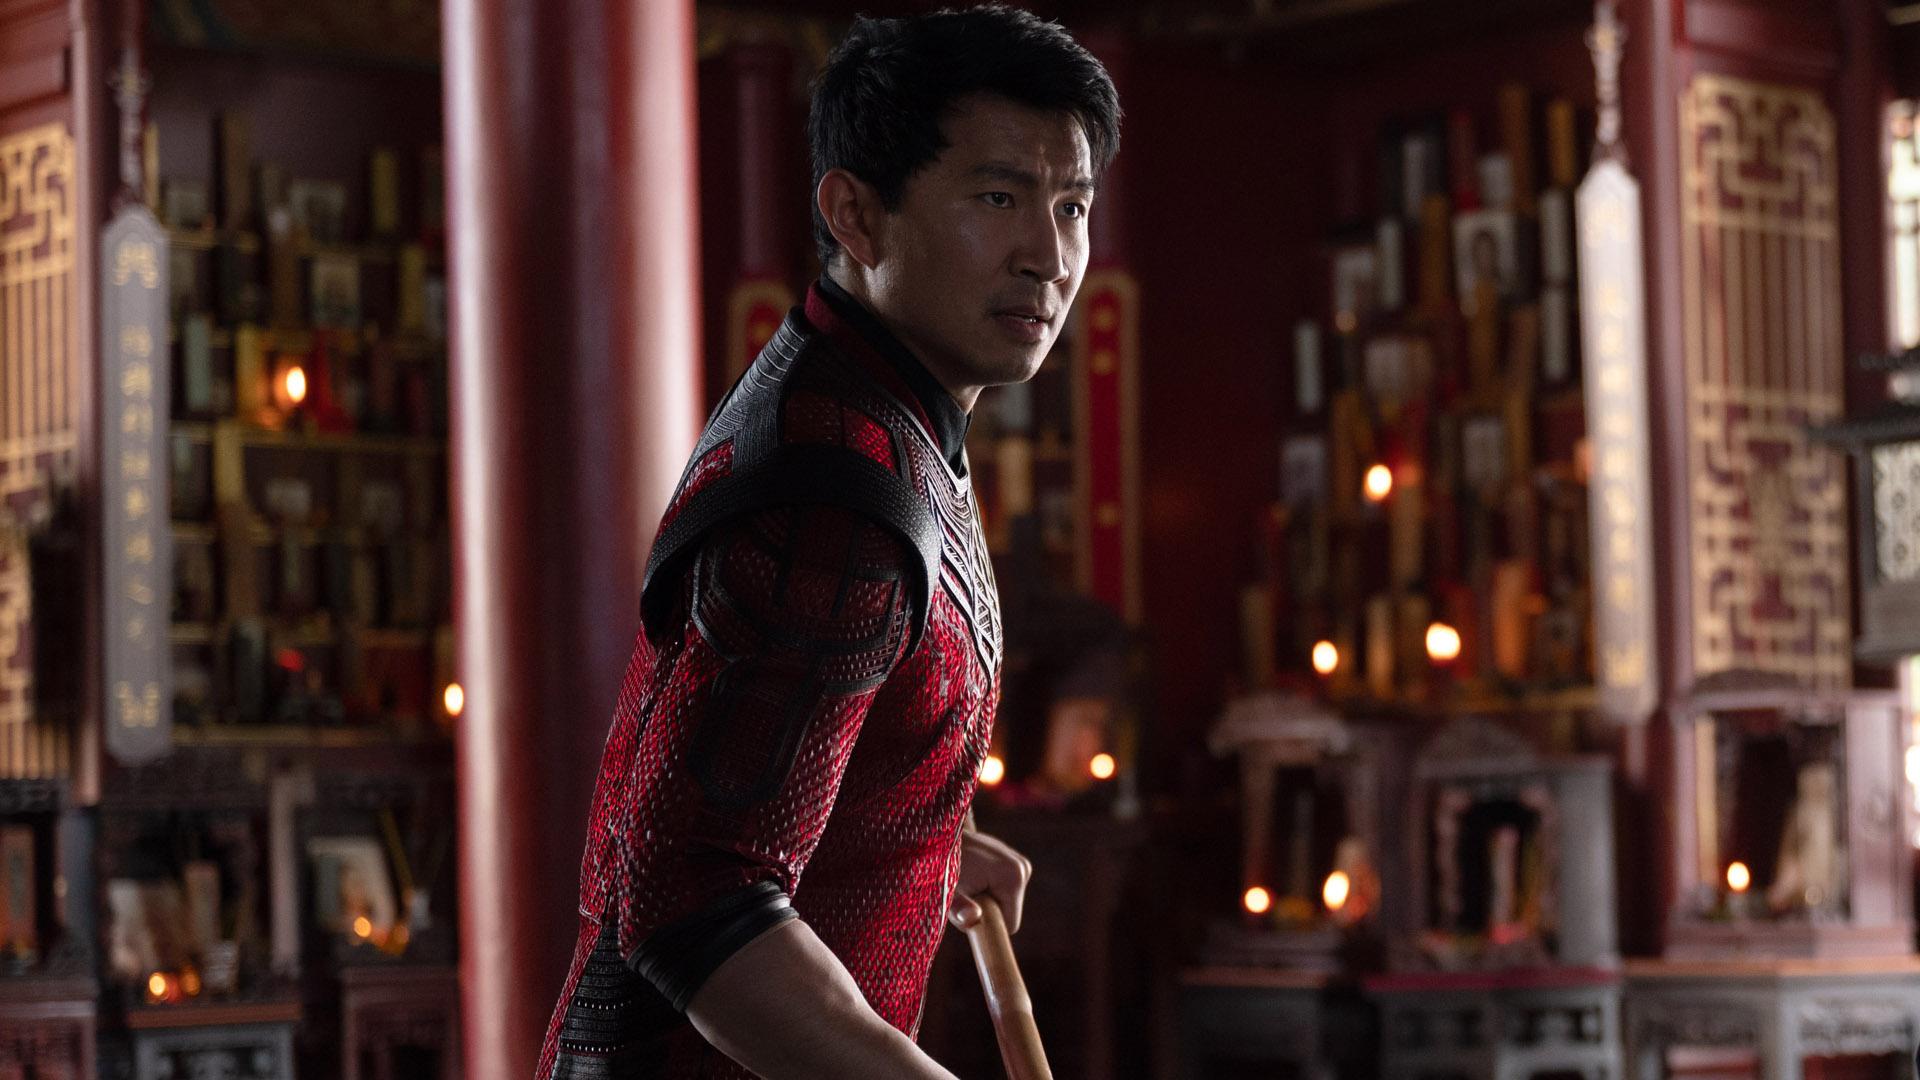 Simu Liu prepares to fight in Marvel's Shang-Chi movie